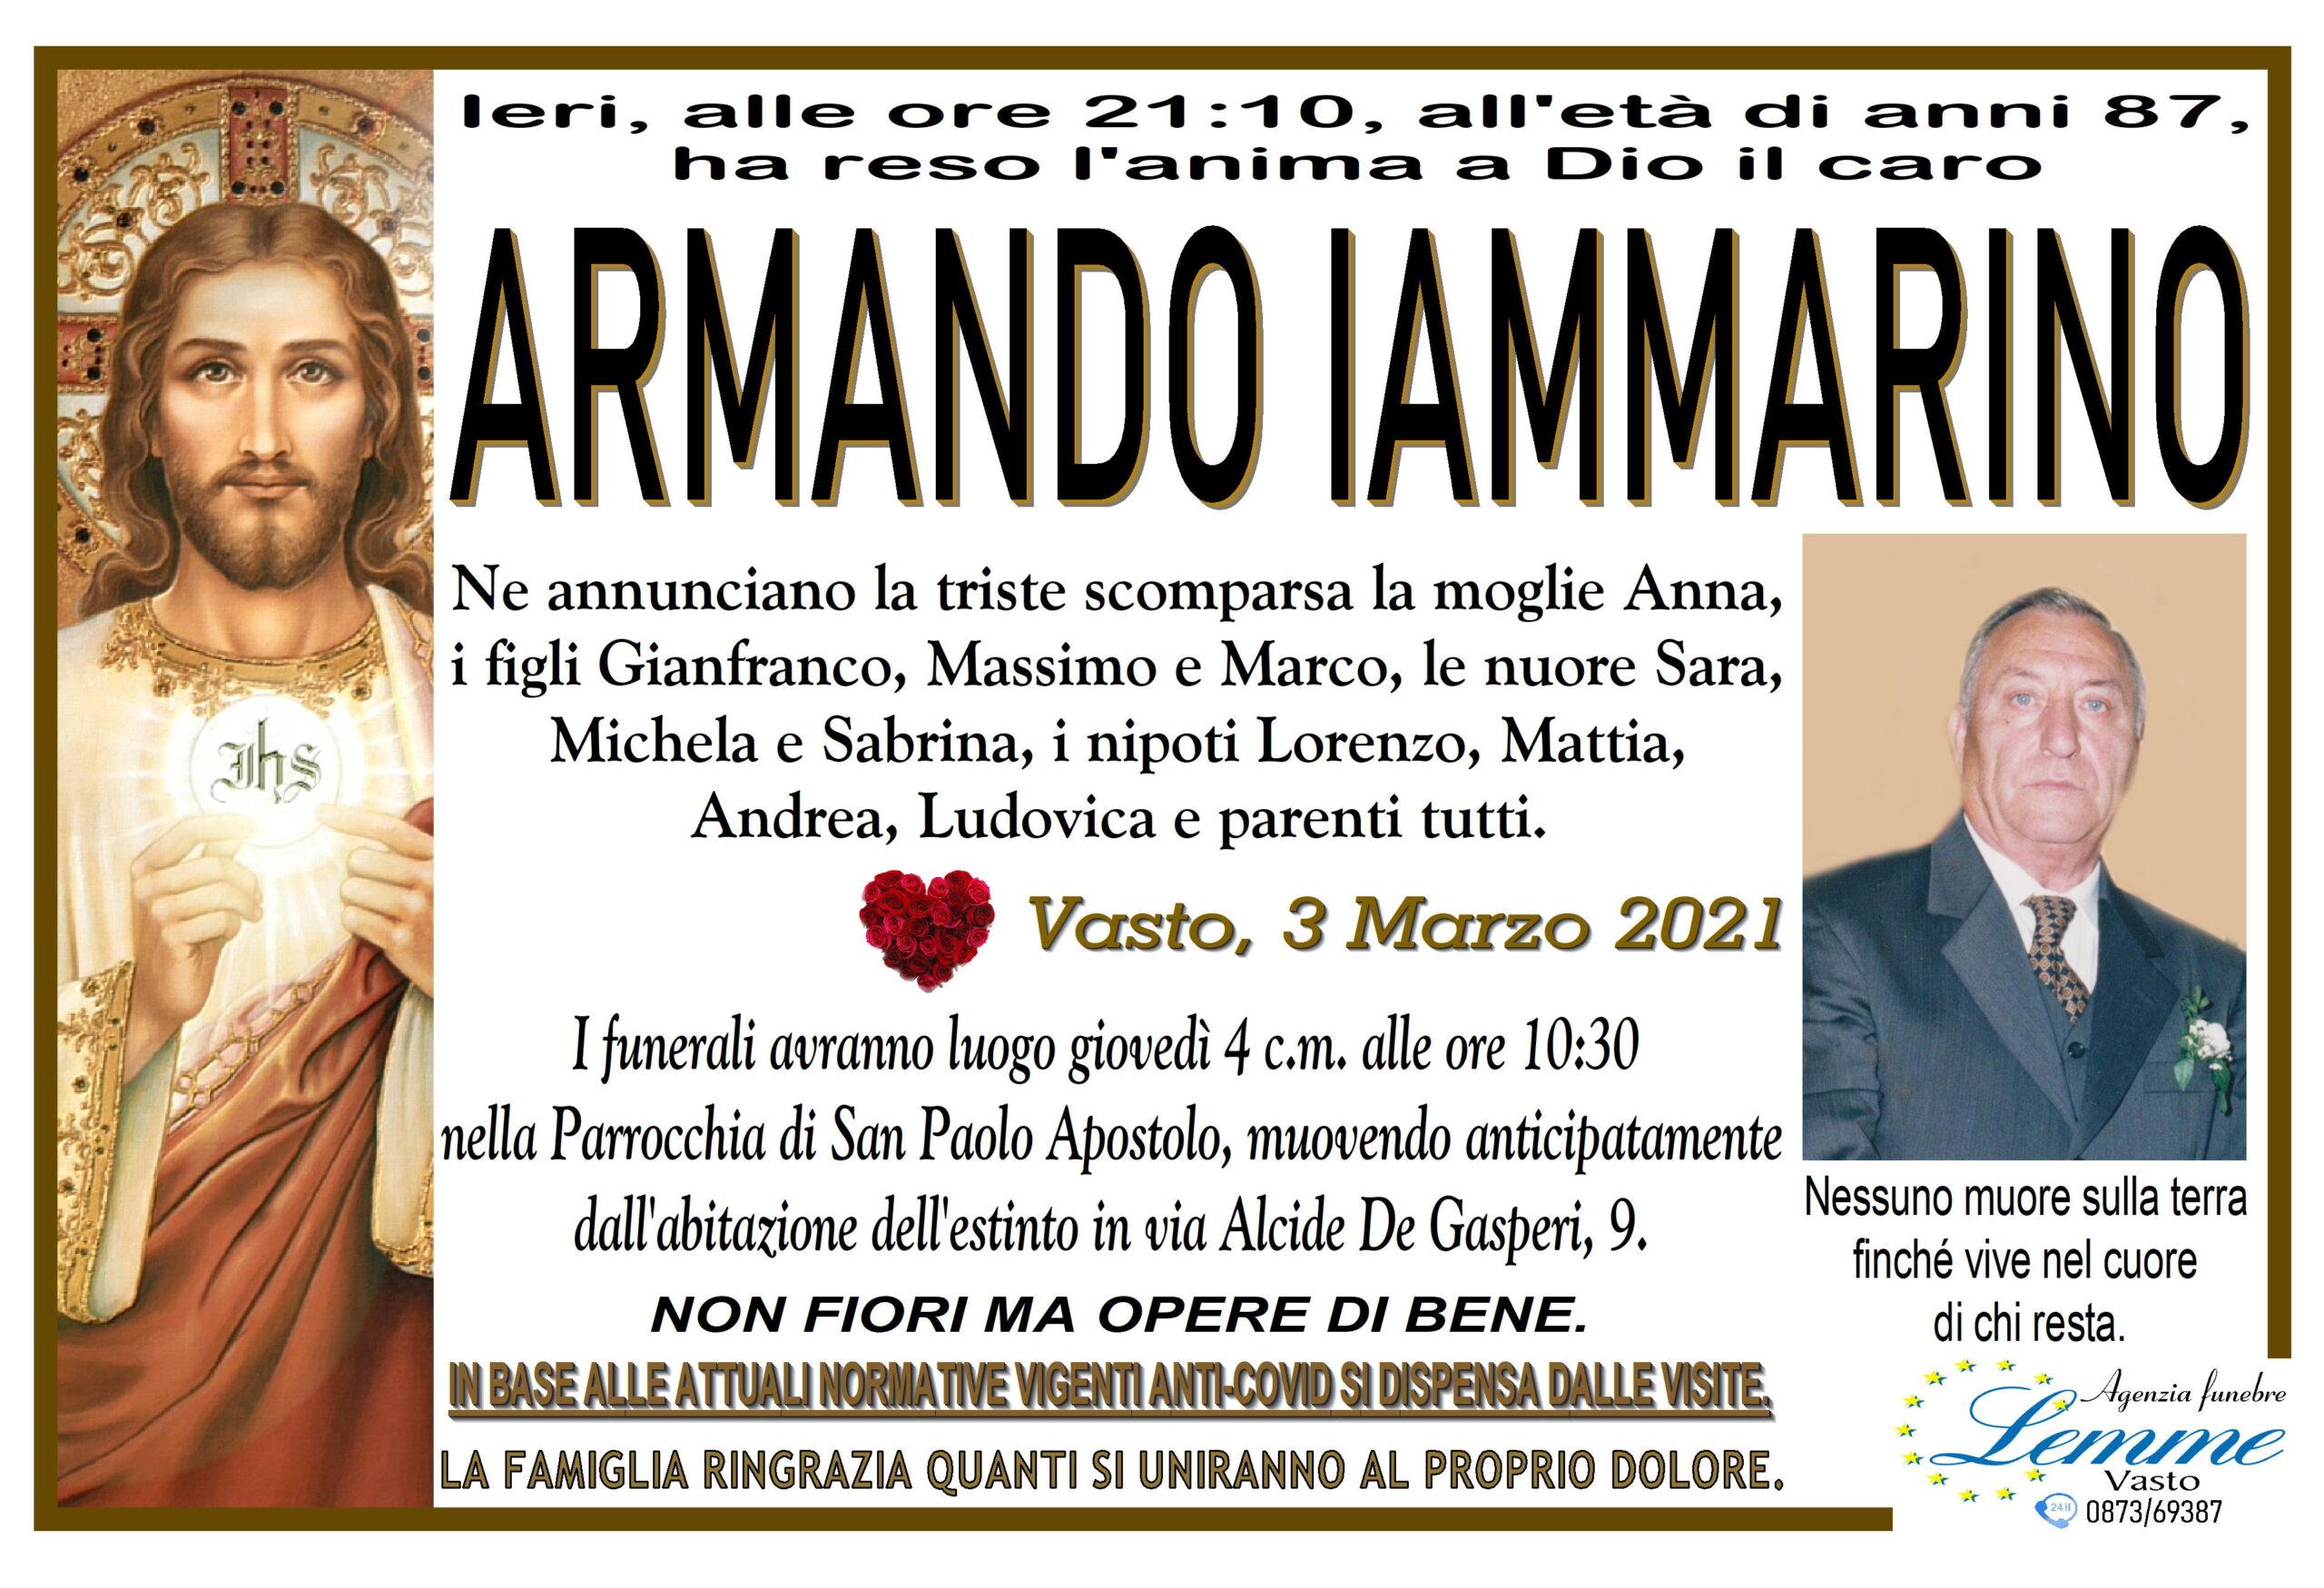 ARMANDO IAMMARINO